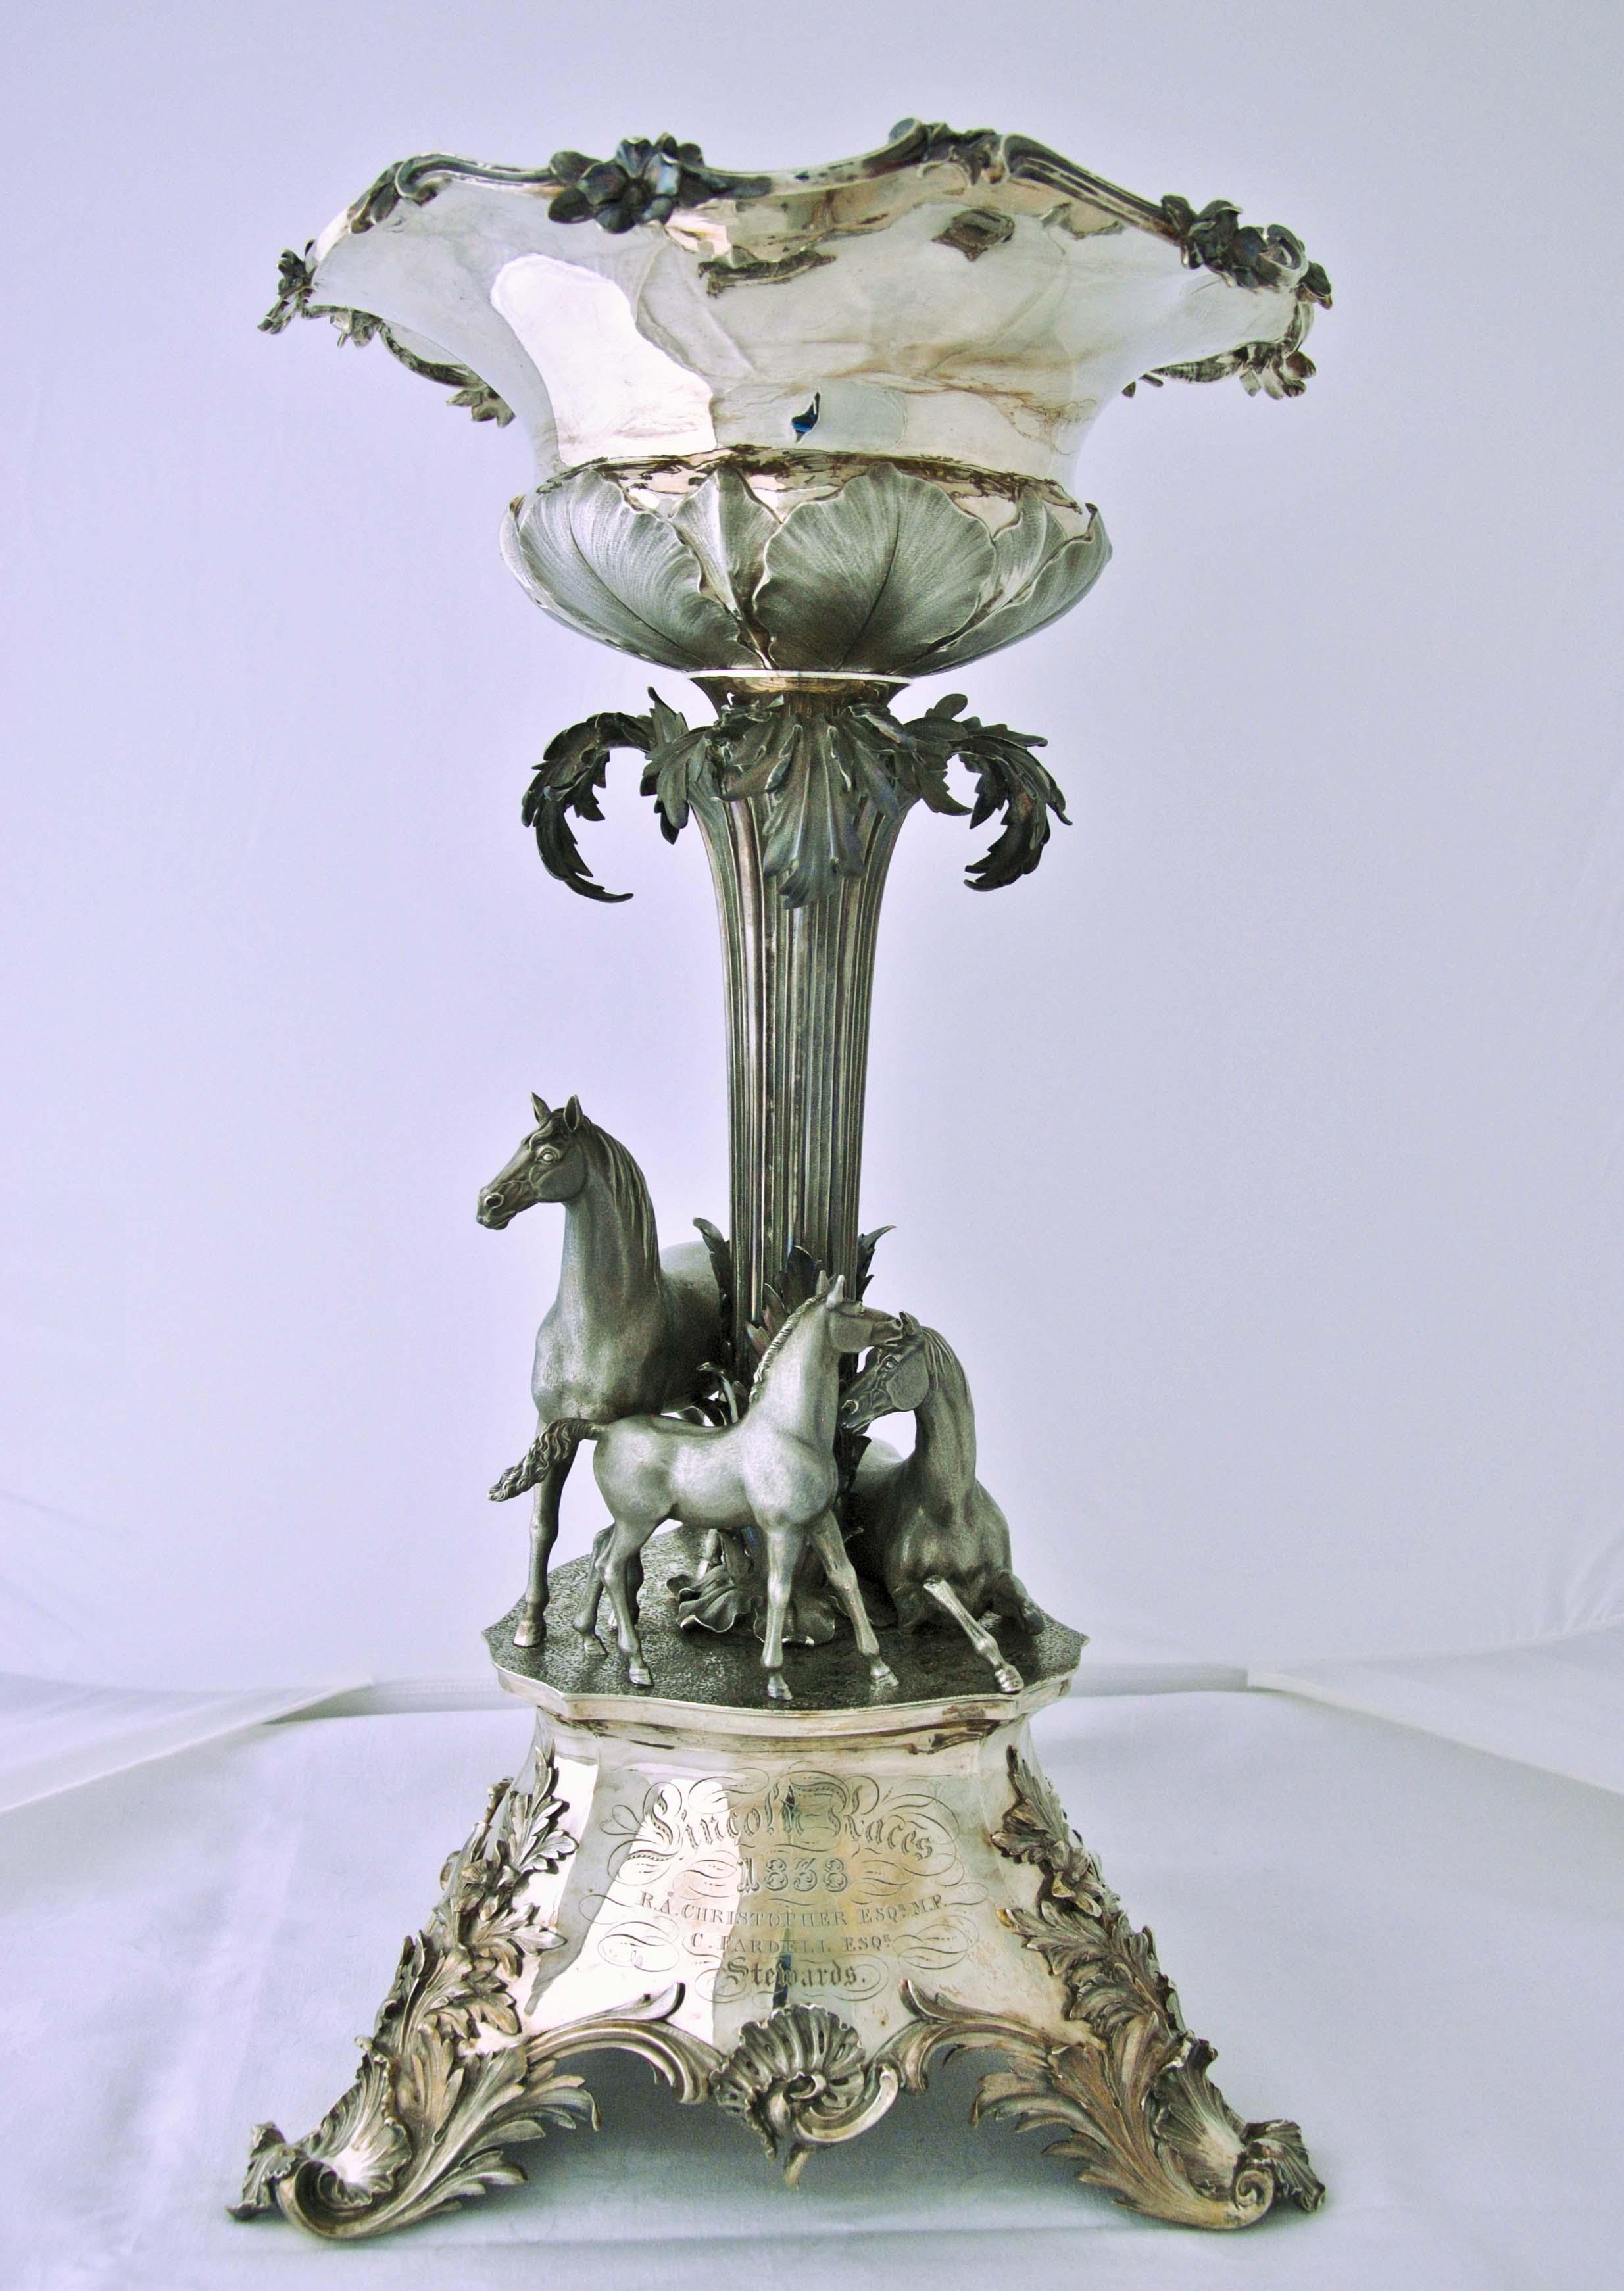 https://0201.nccdn.net/4_2/000/000/078/264/lincoln-races-trophy-1838.jpg